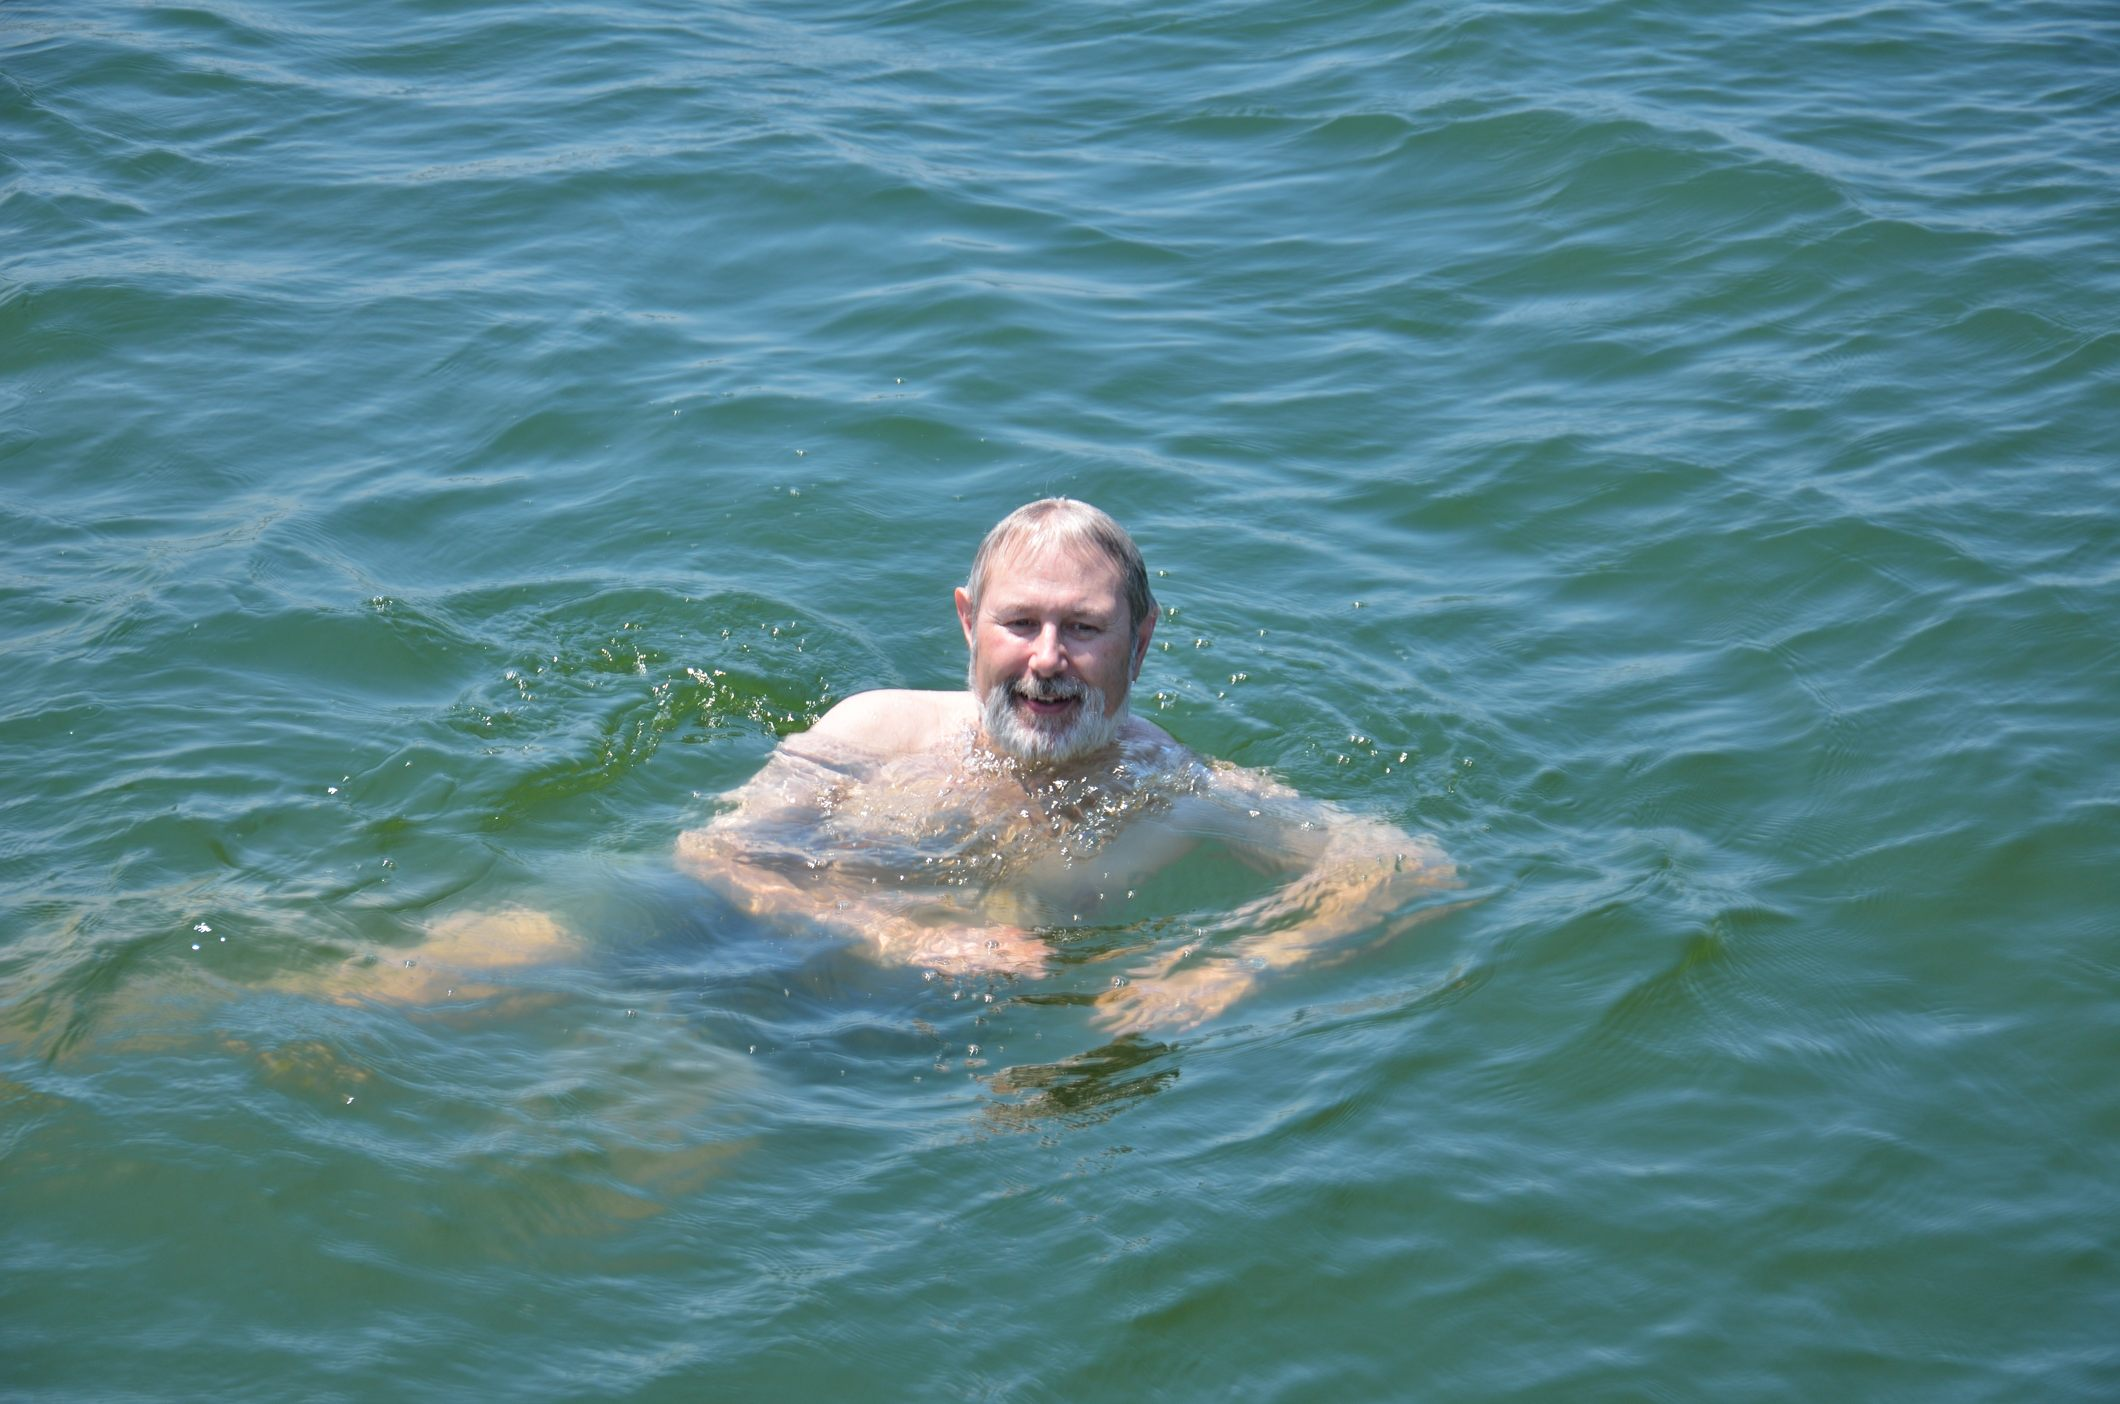 Anchored in Stockton Lake